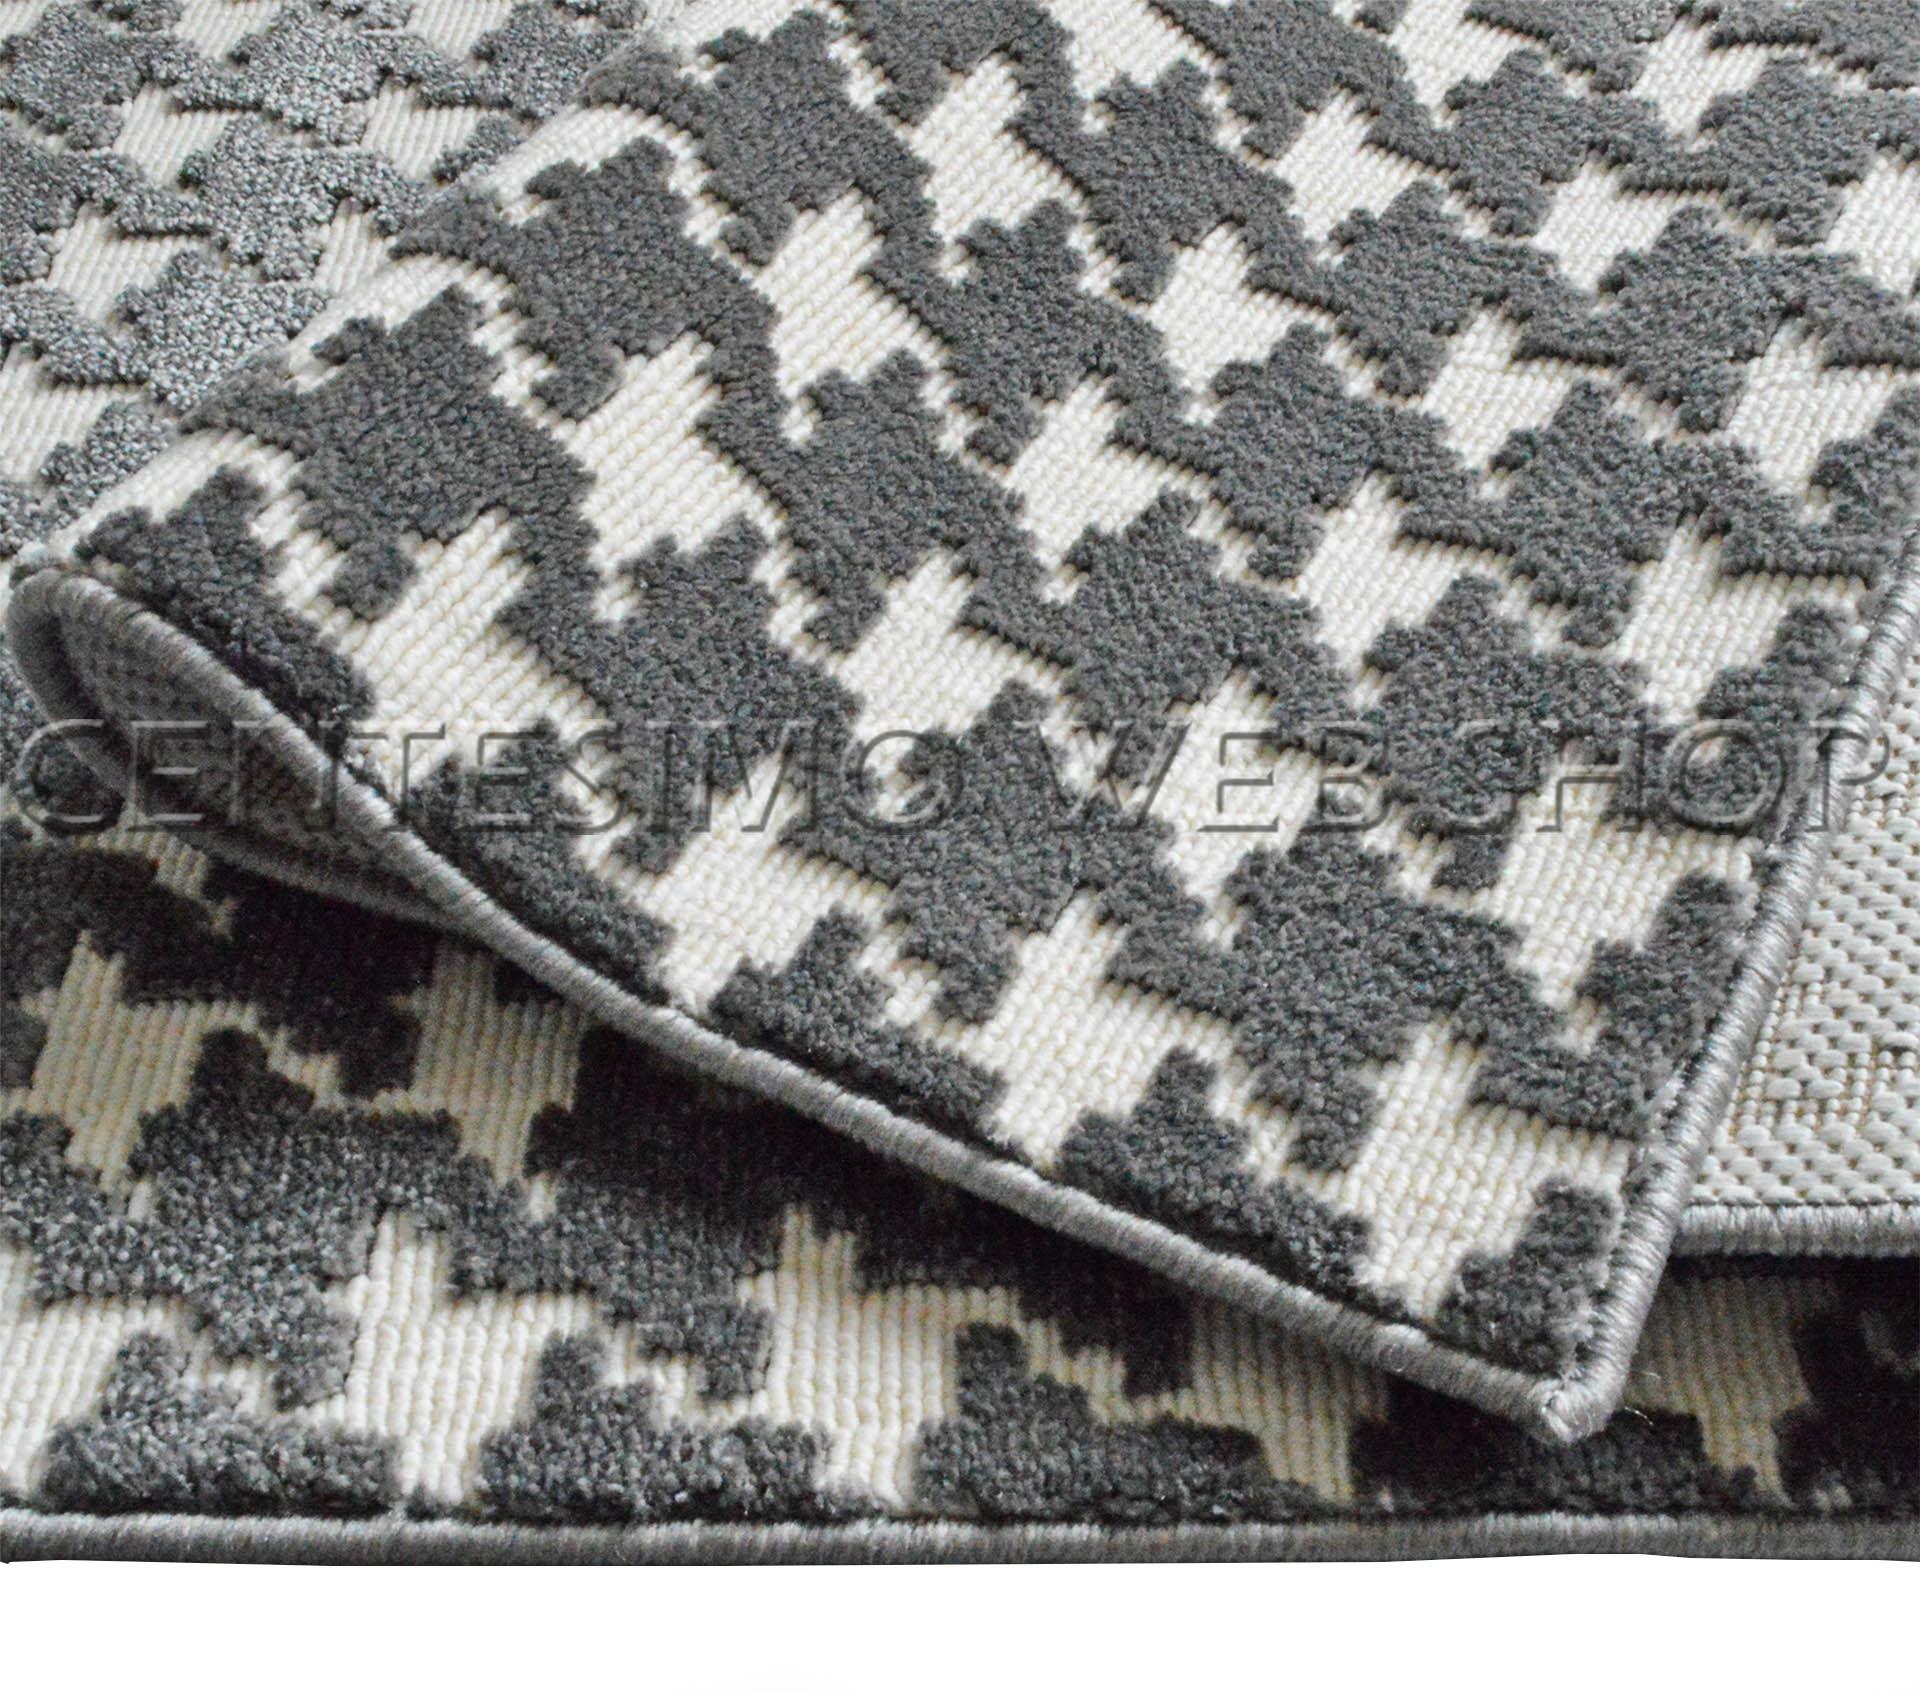 tappeto moderno 3 misure arredo sala camera pied de poule grigio